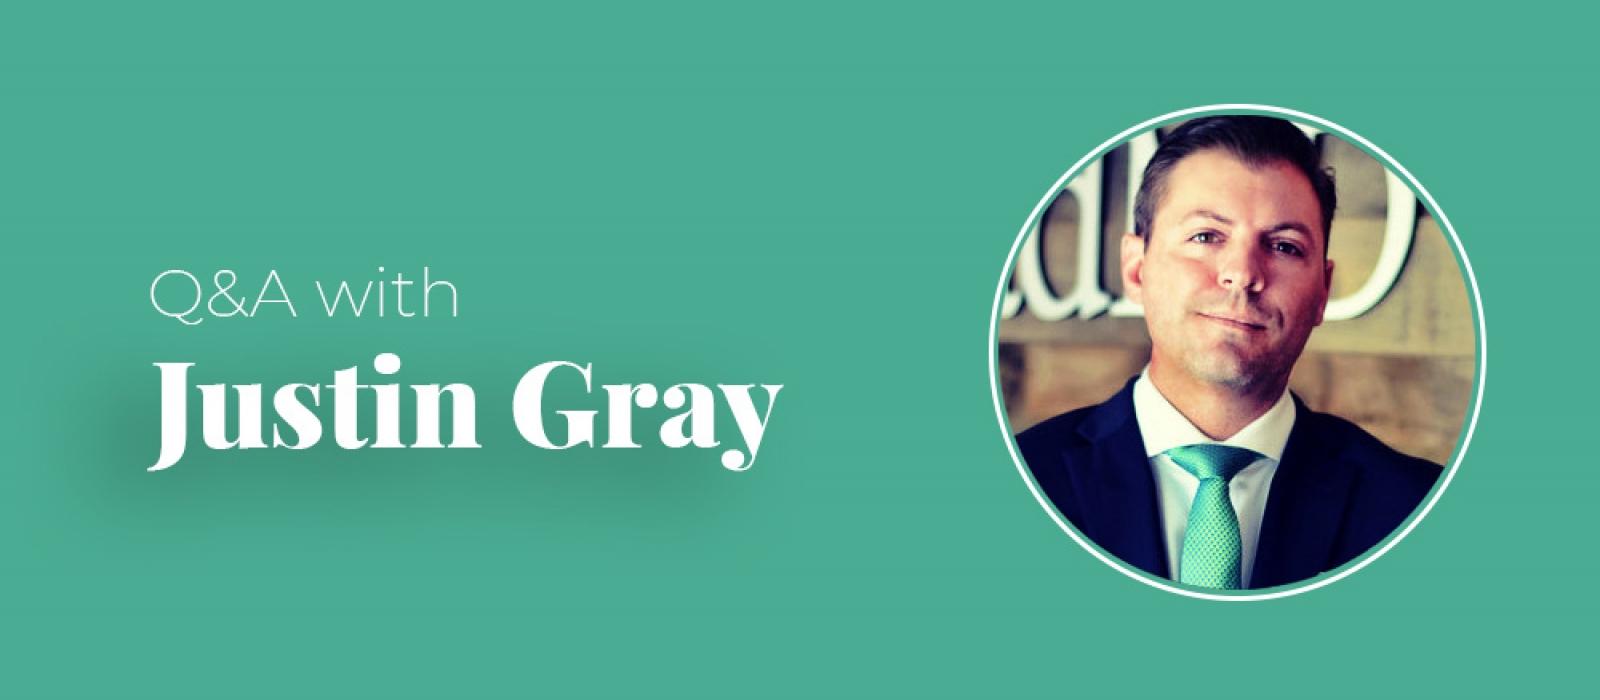 justin-gray